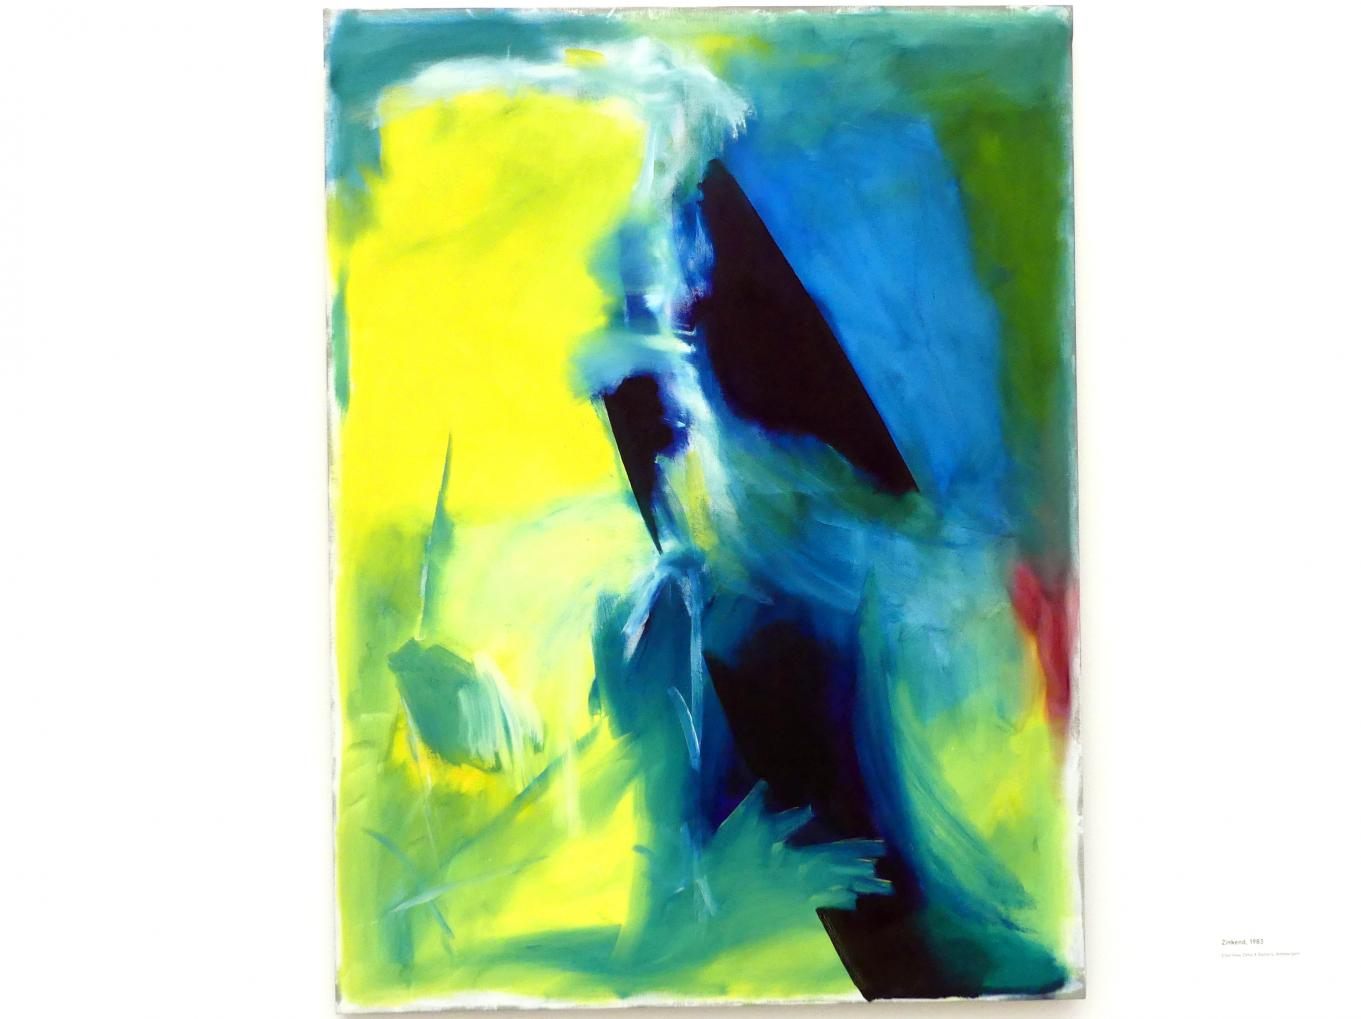 Raoul De Keyser: Zinkend - Untergang, 1983